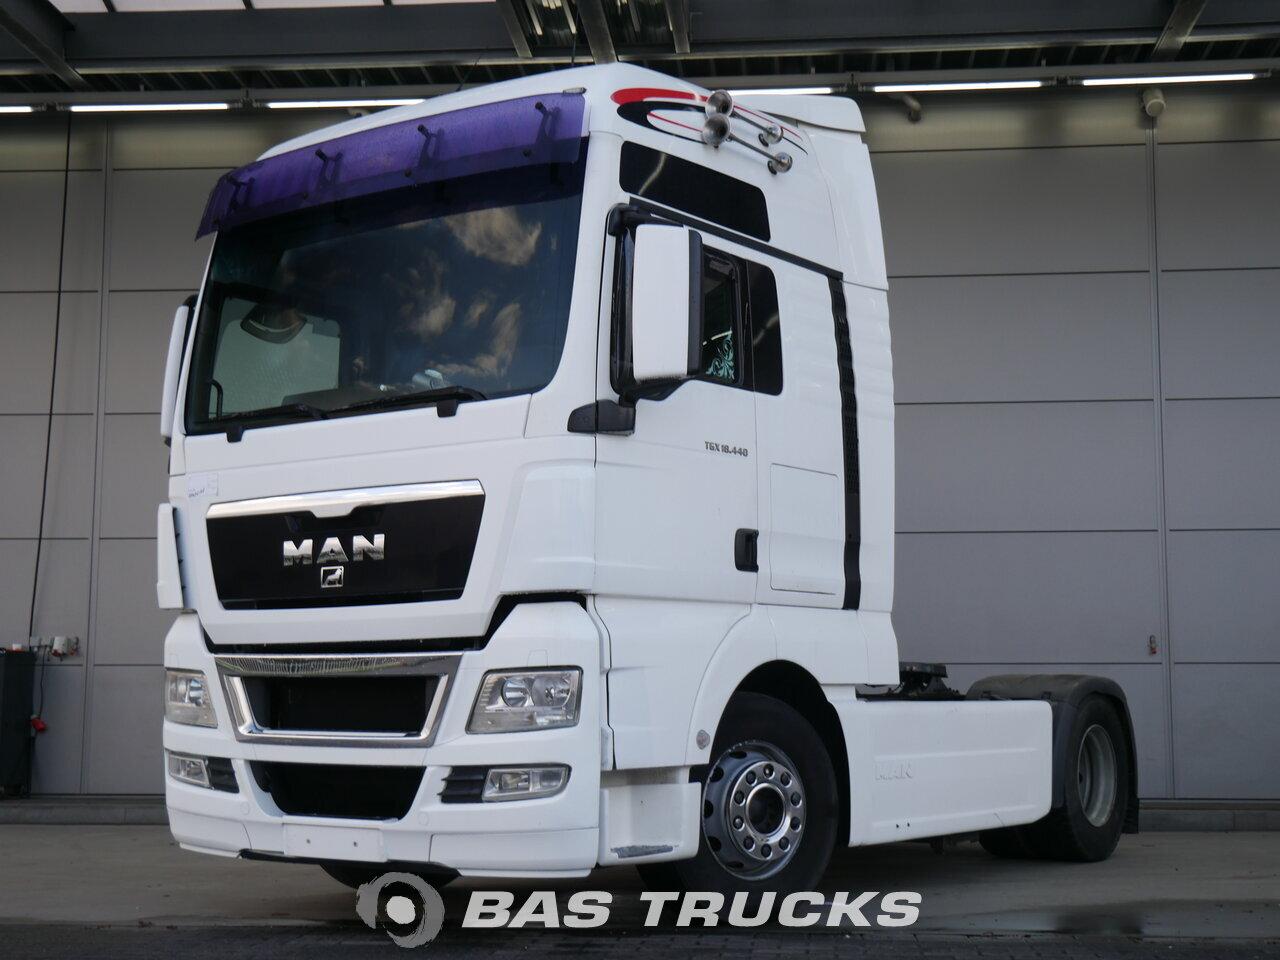 man tgx xxl tractorhead euro norm 5 13800 bas trucks. Black Bedroom Furniture Sets. Home Design Ideas